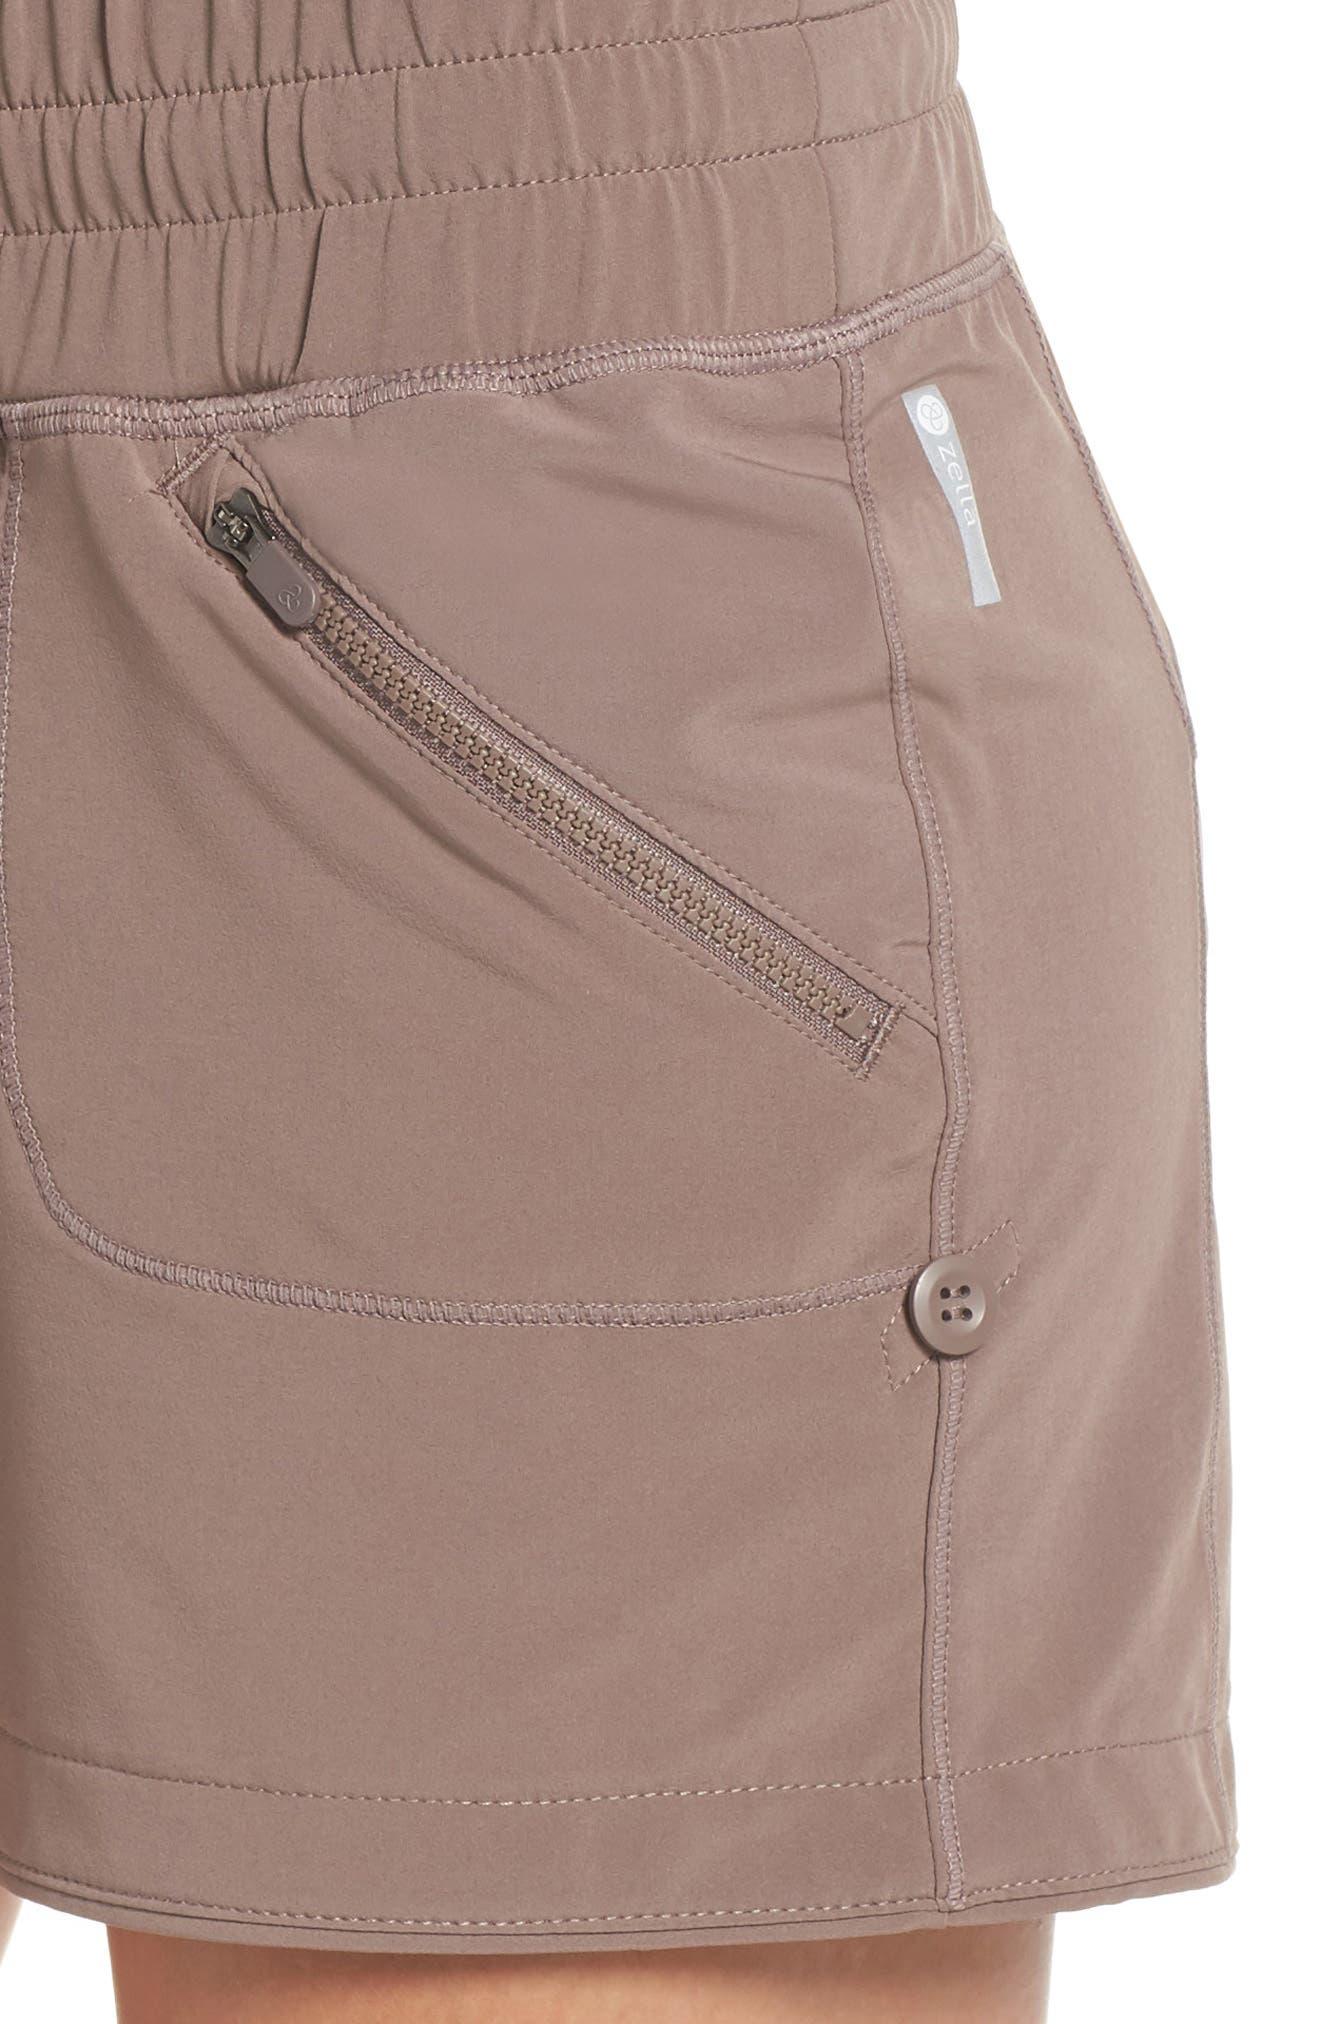 Switchback Shorts,                             Alternate thumbnail 30, color,